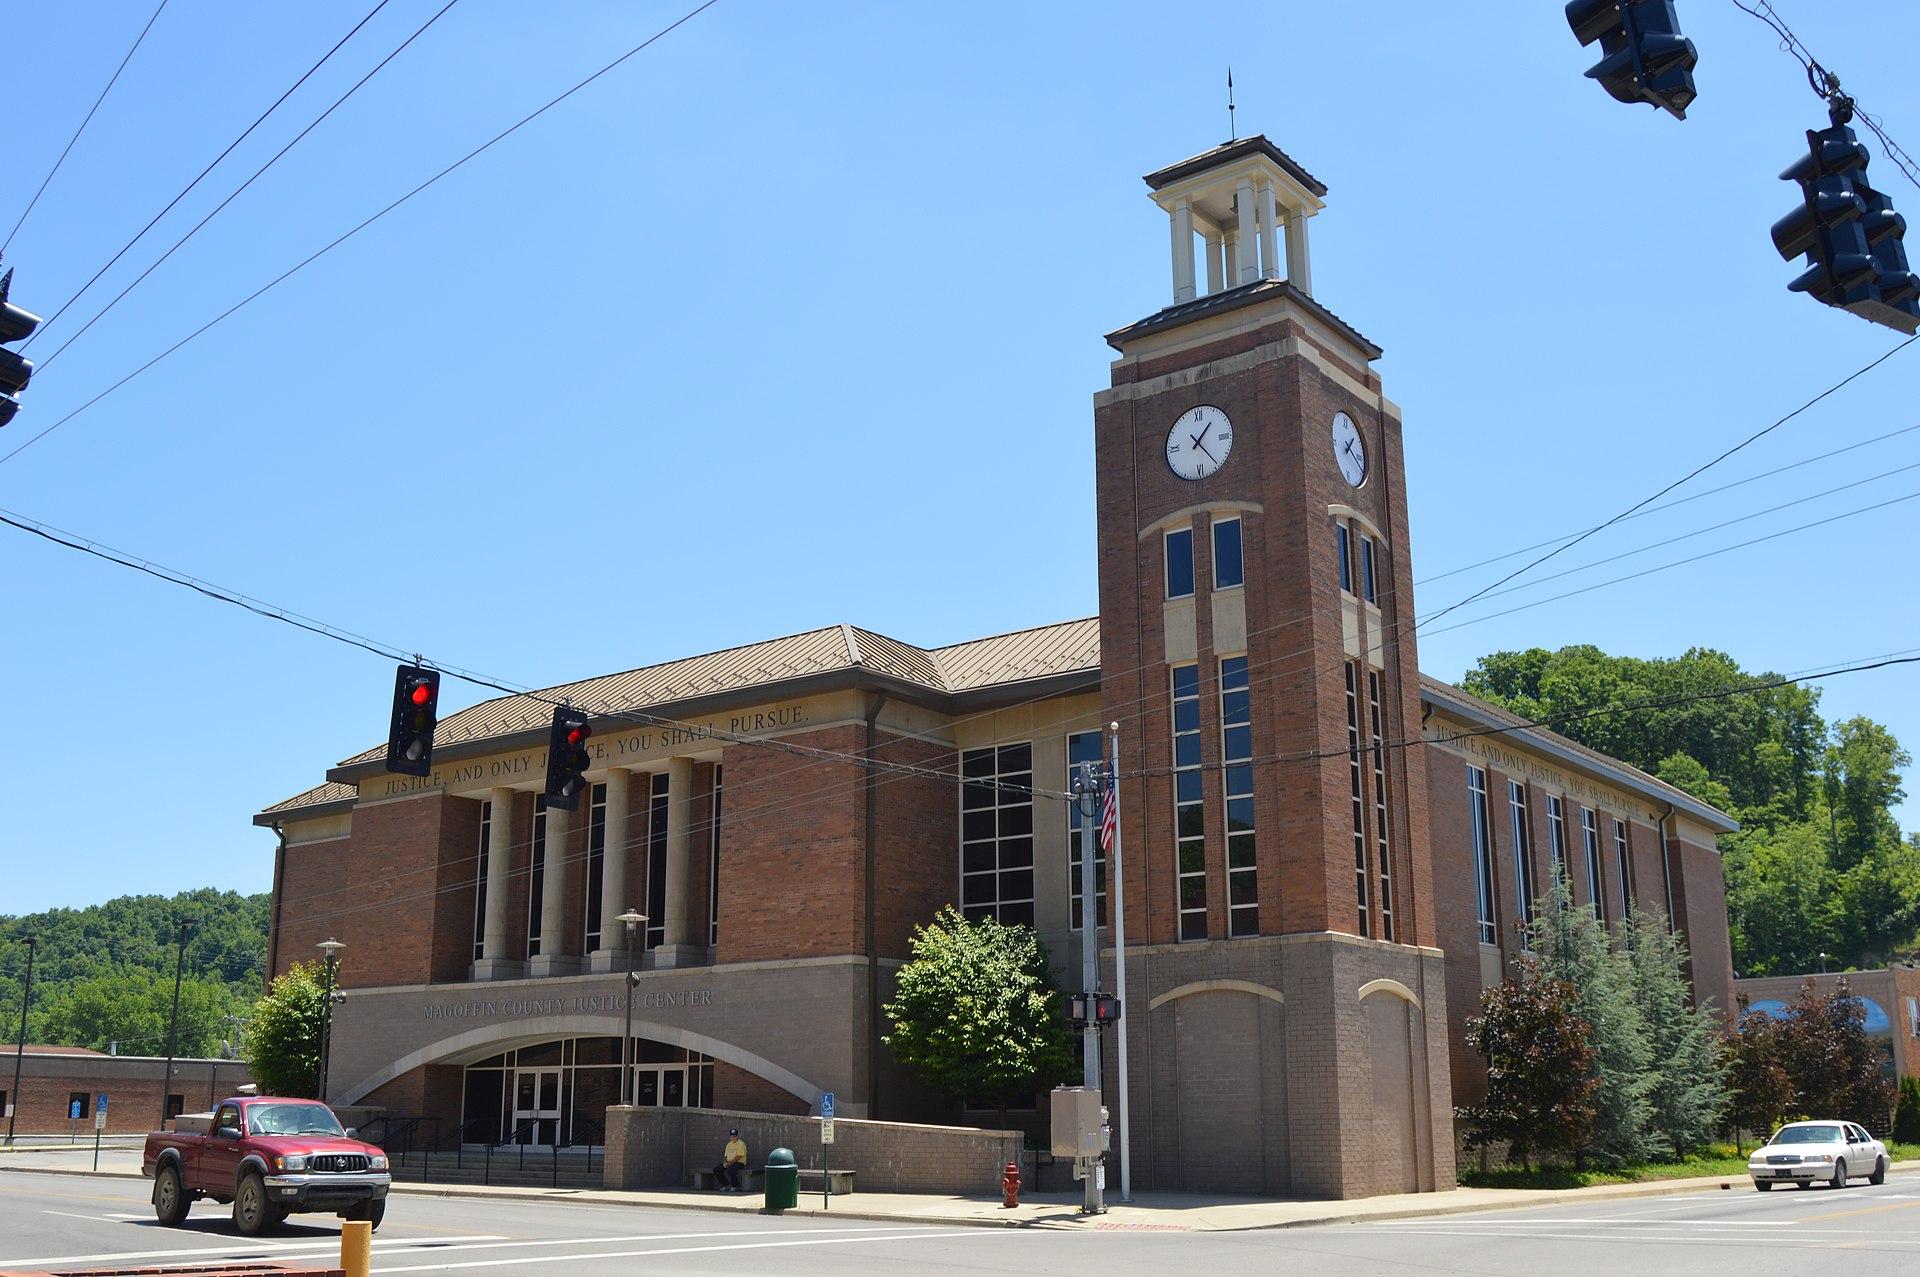 Martin County Ky Property Taxes